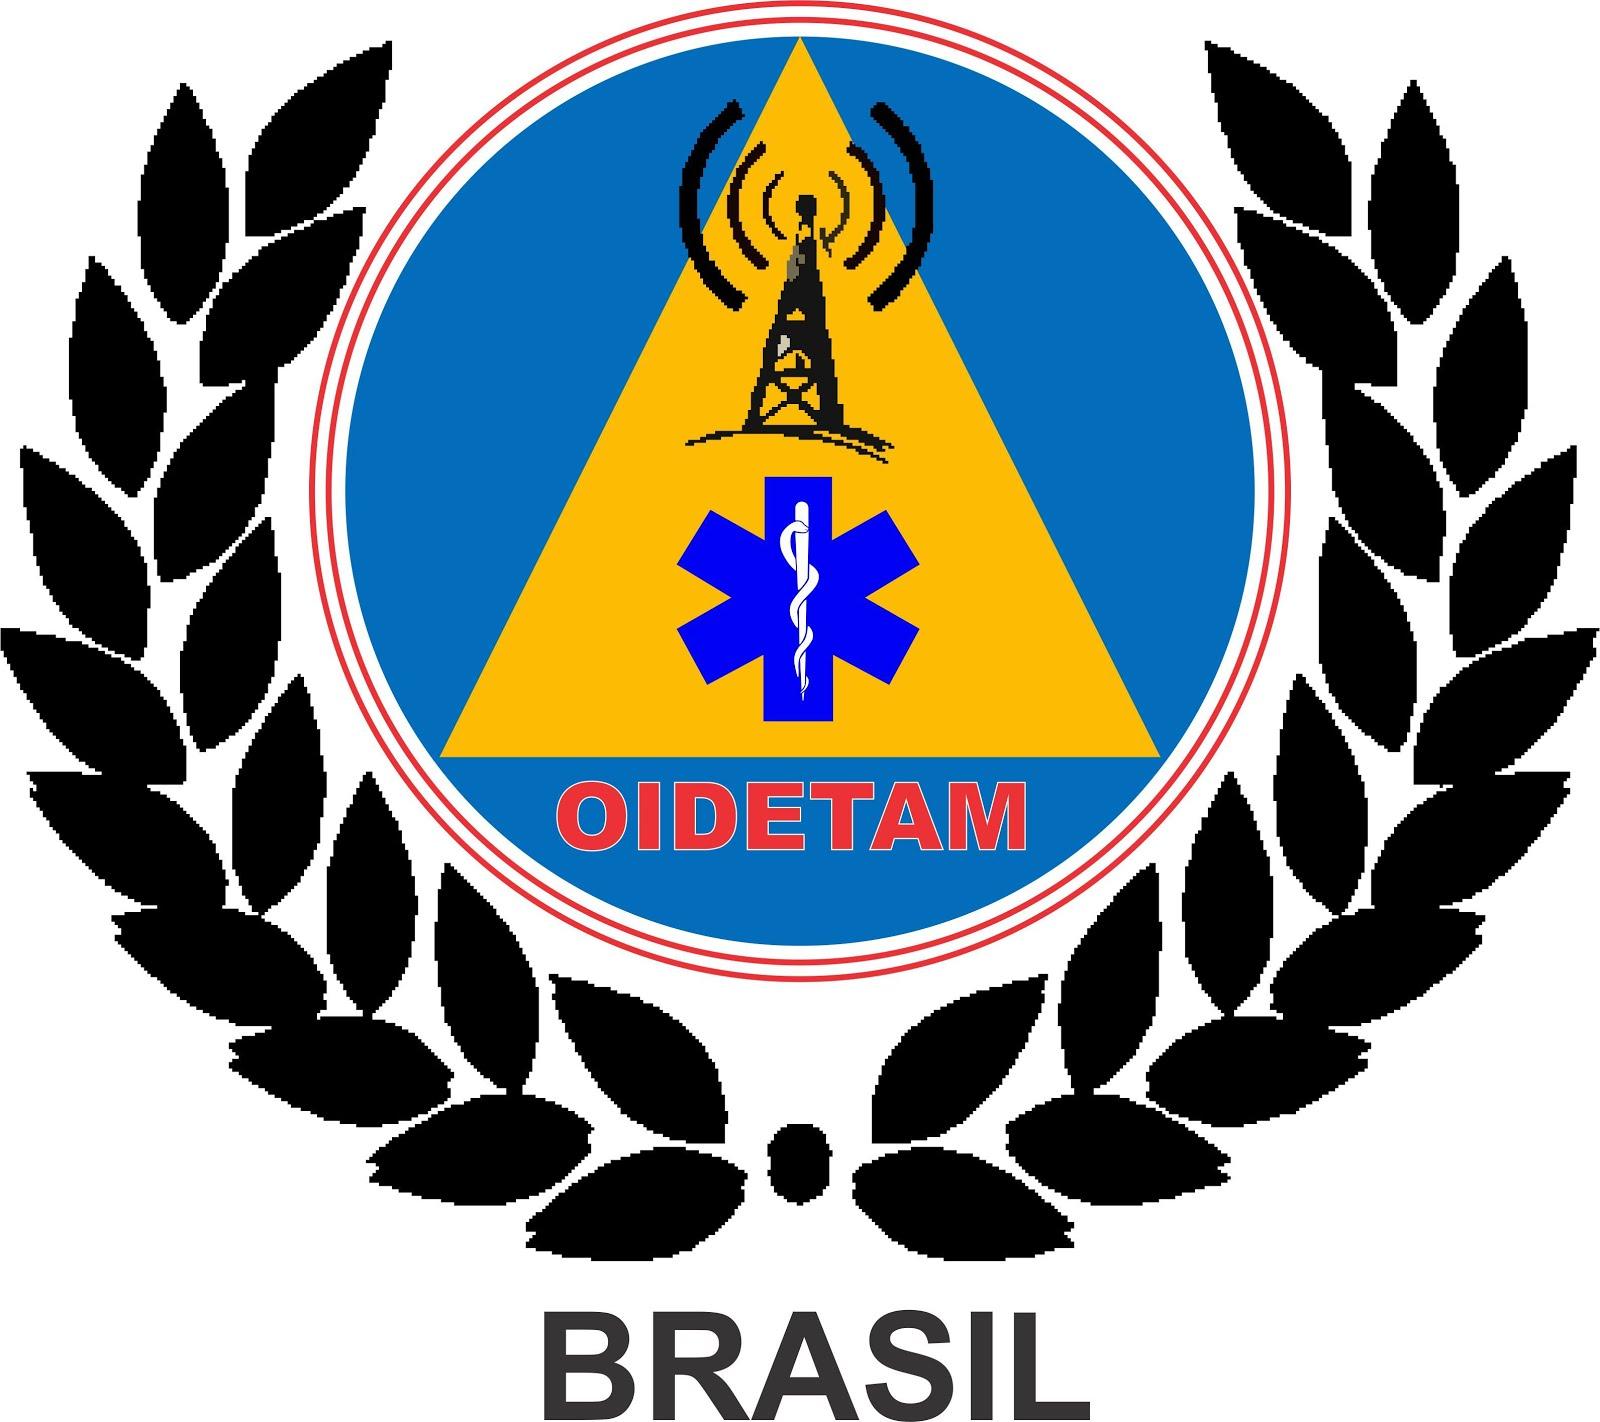 OIDETAM BRASIL